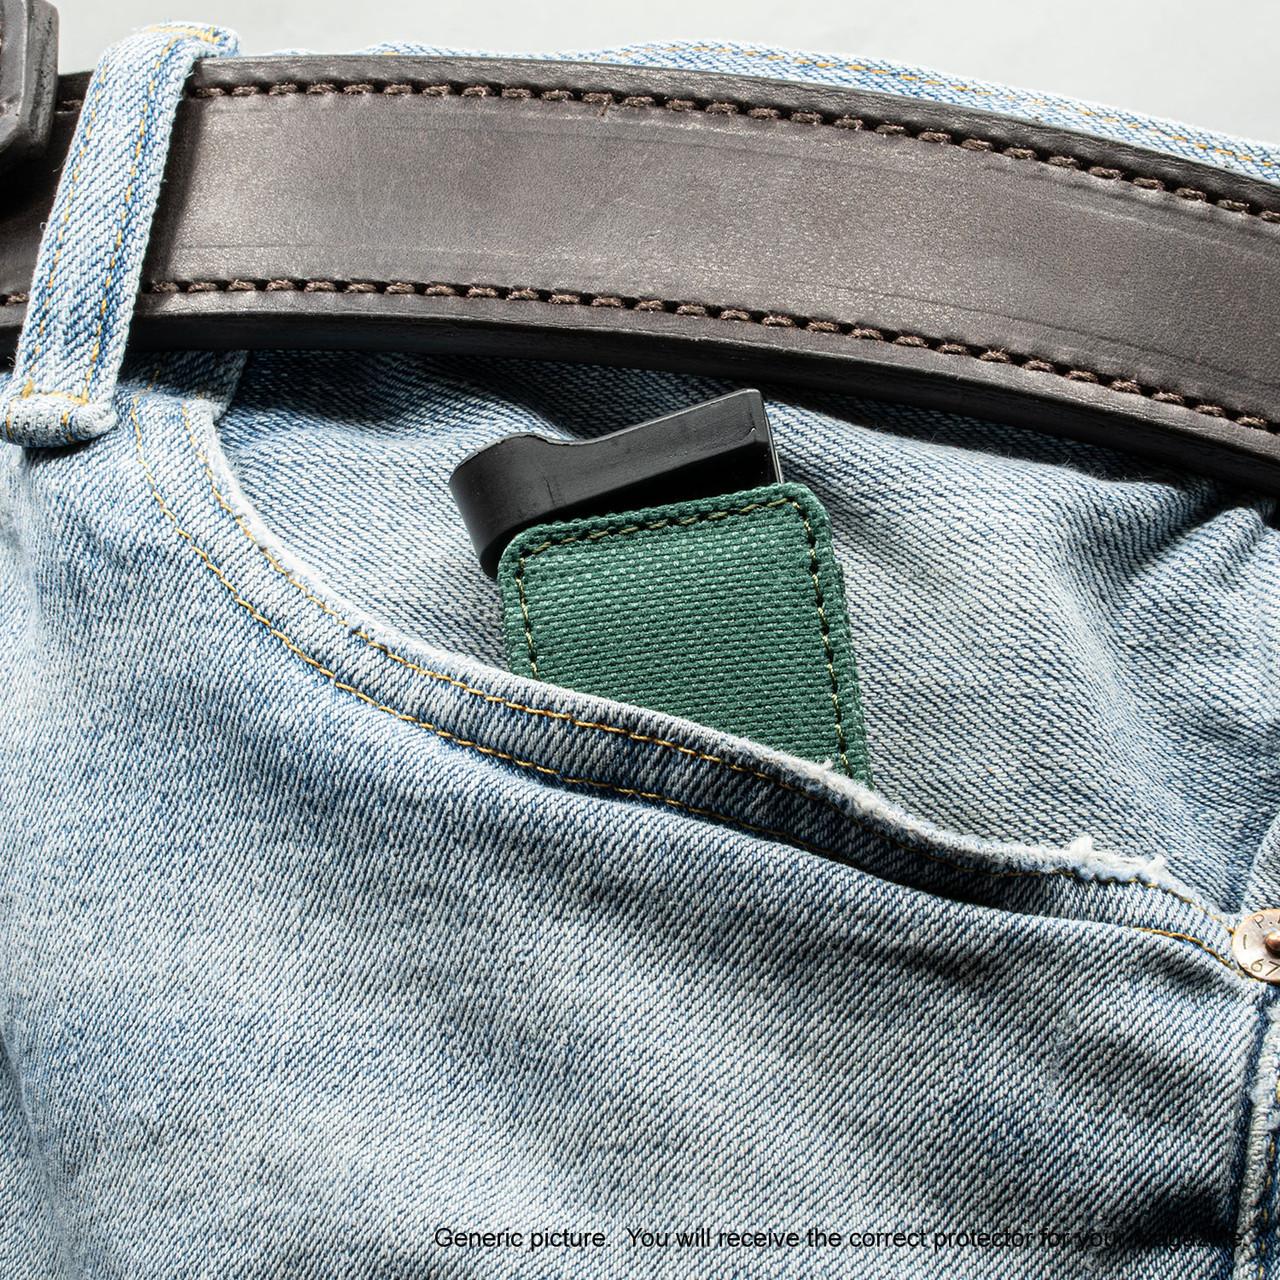 Remington RM380 Green Covert Magazine Pocket Protector